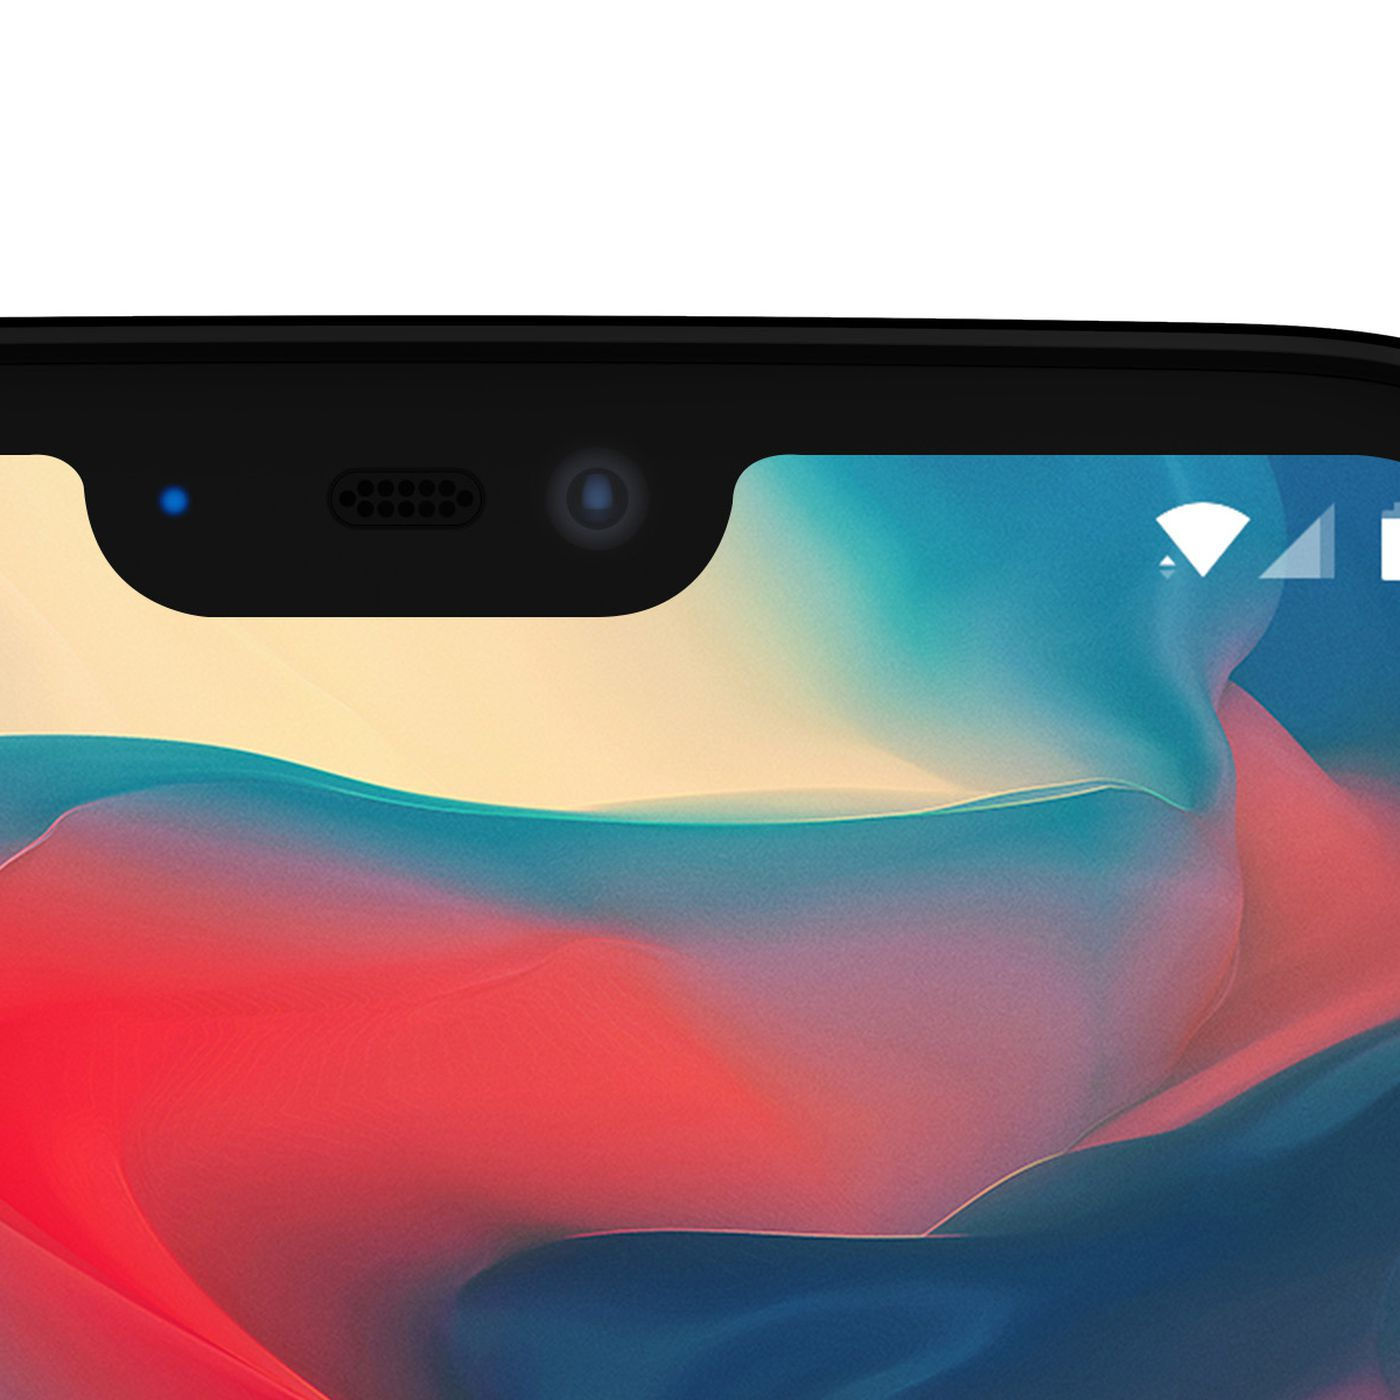 theverge.com - Vlad Savov - OnePlus is going to start making TVs